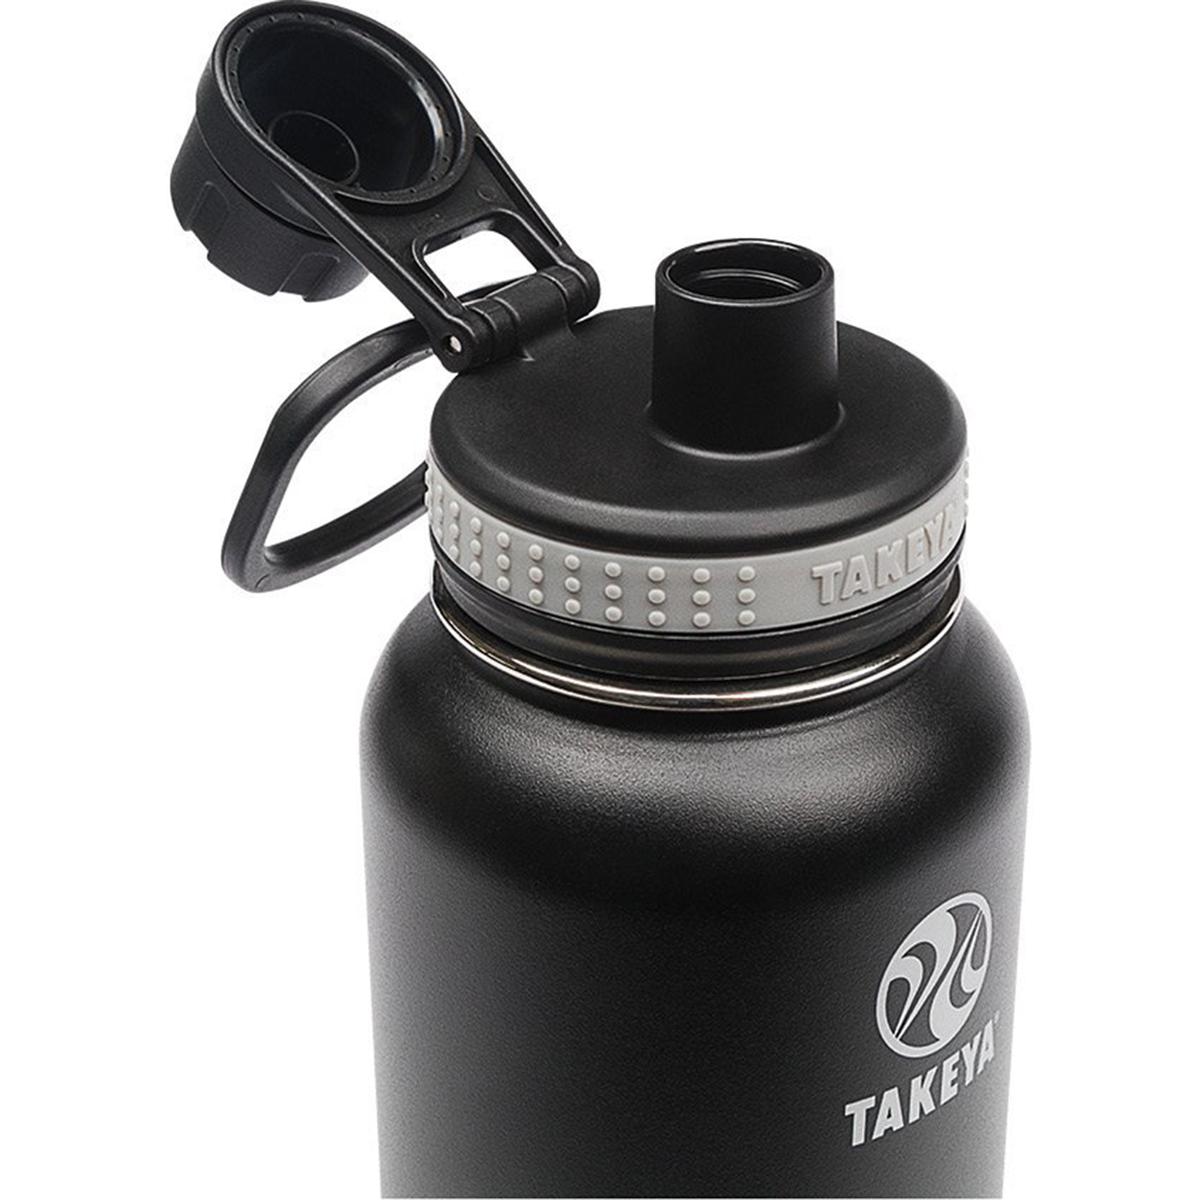 Takeya-Originals-40-oz-Insulated-Stainless-Steel-Water-Bottle thumbnail 3